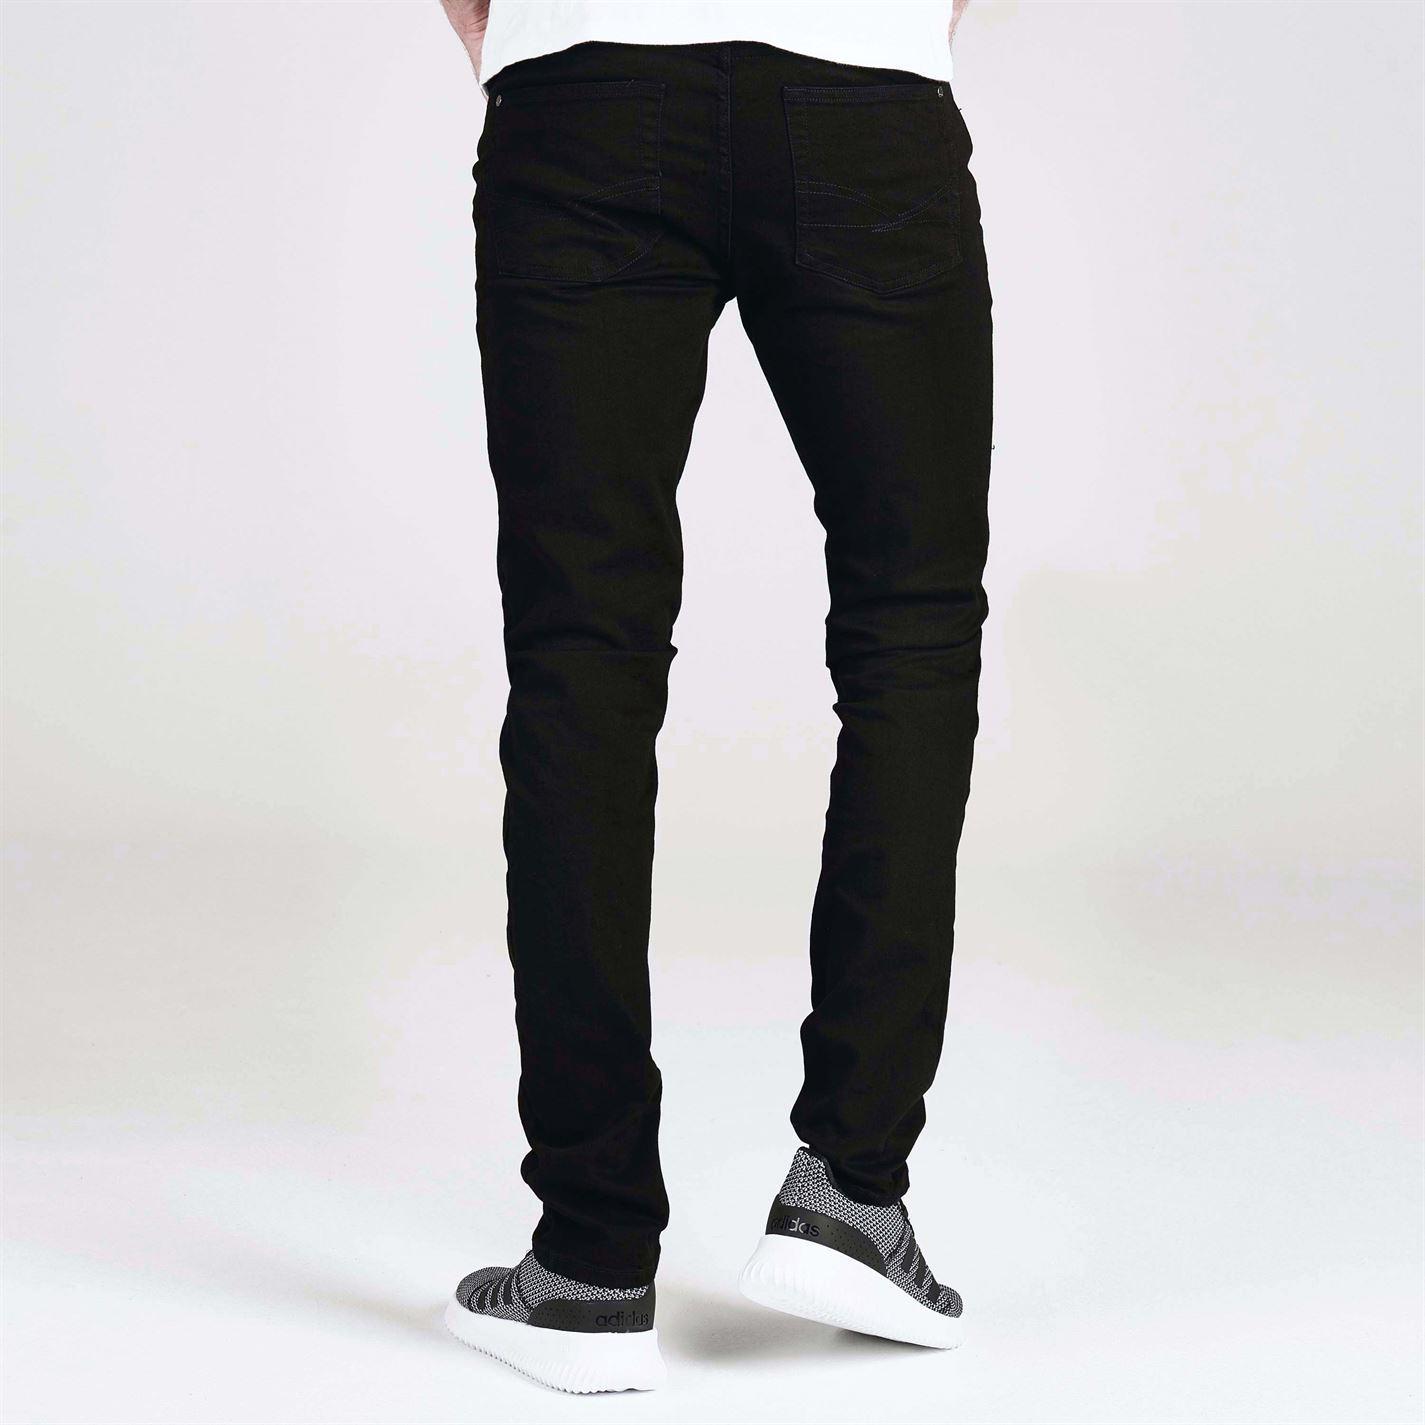 Jeans-Denim-Firetrap-Skinny-Mens-Trouser-Black thumbnail 18